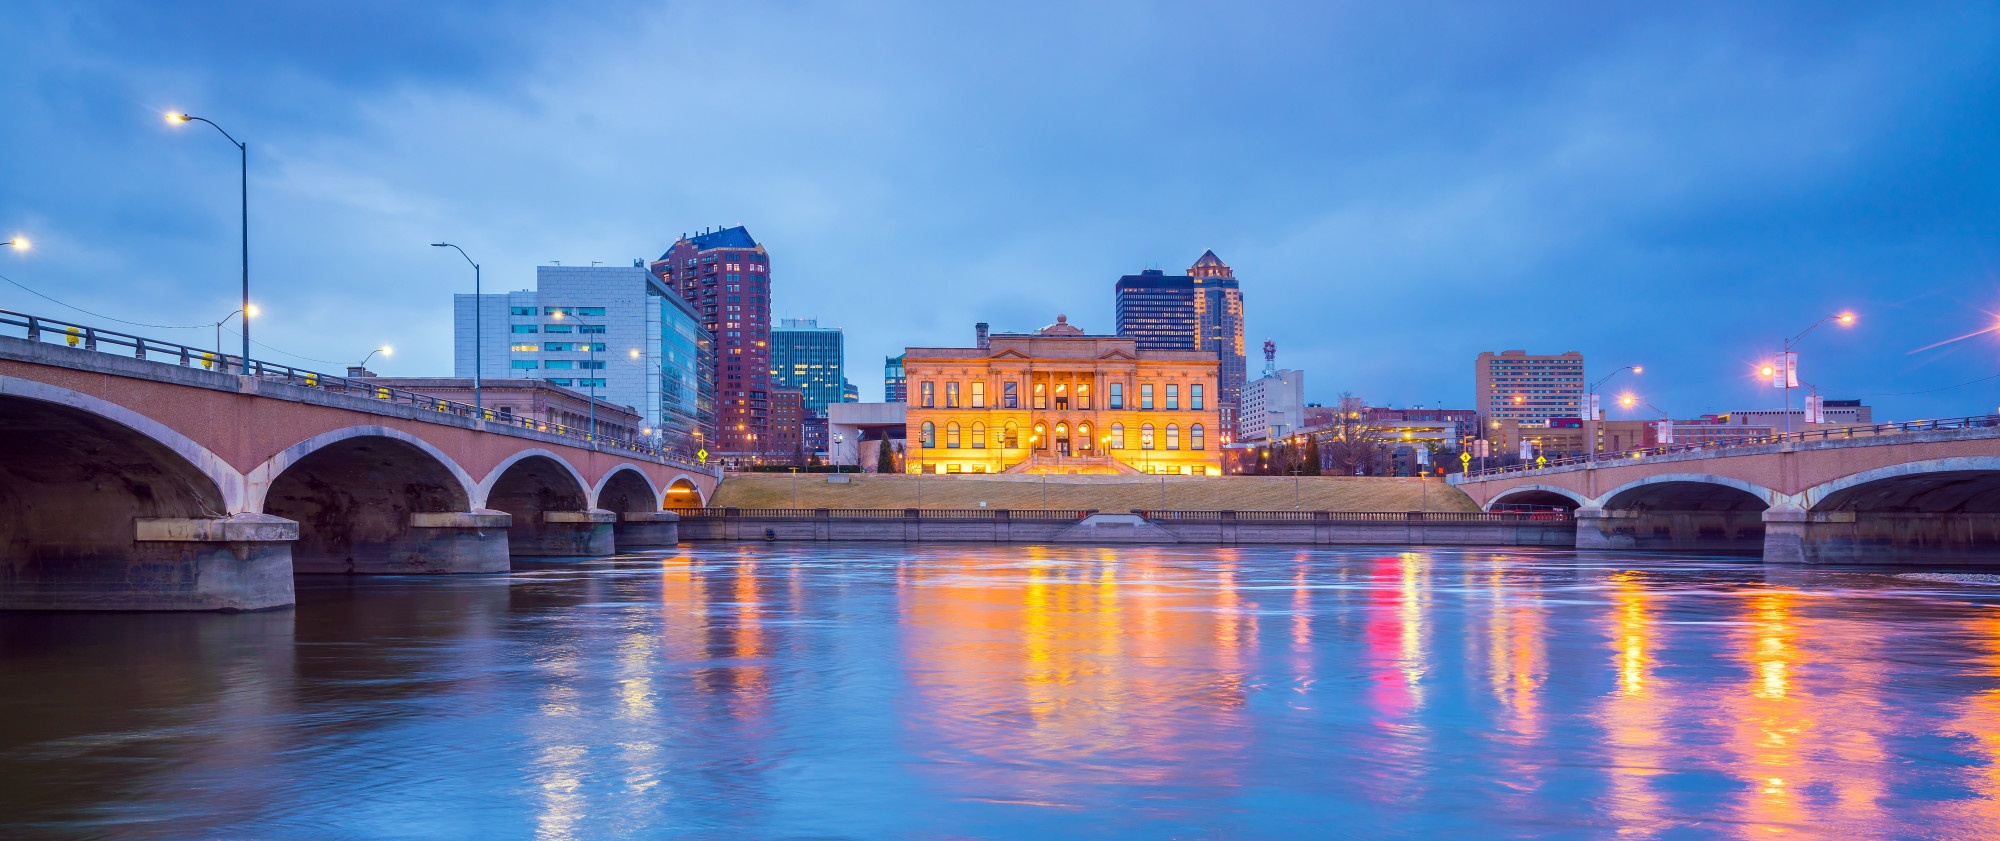 Des Moines Iowa at sunset